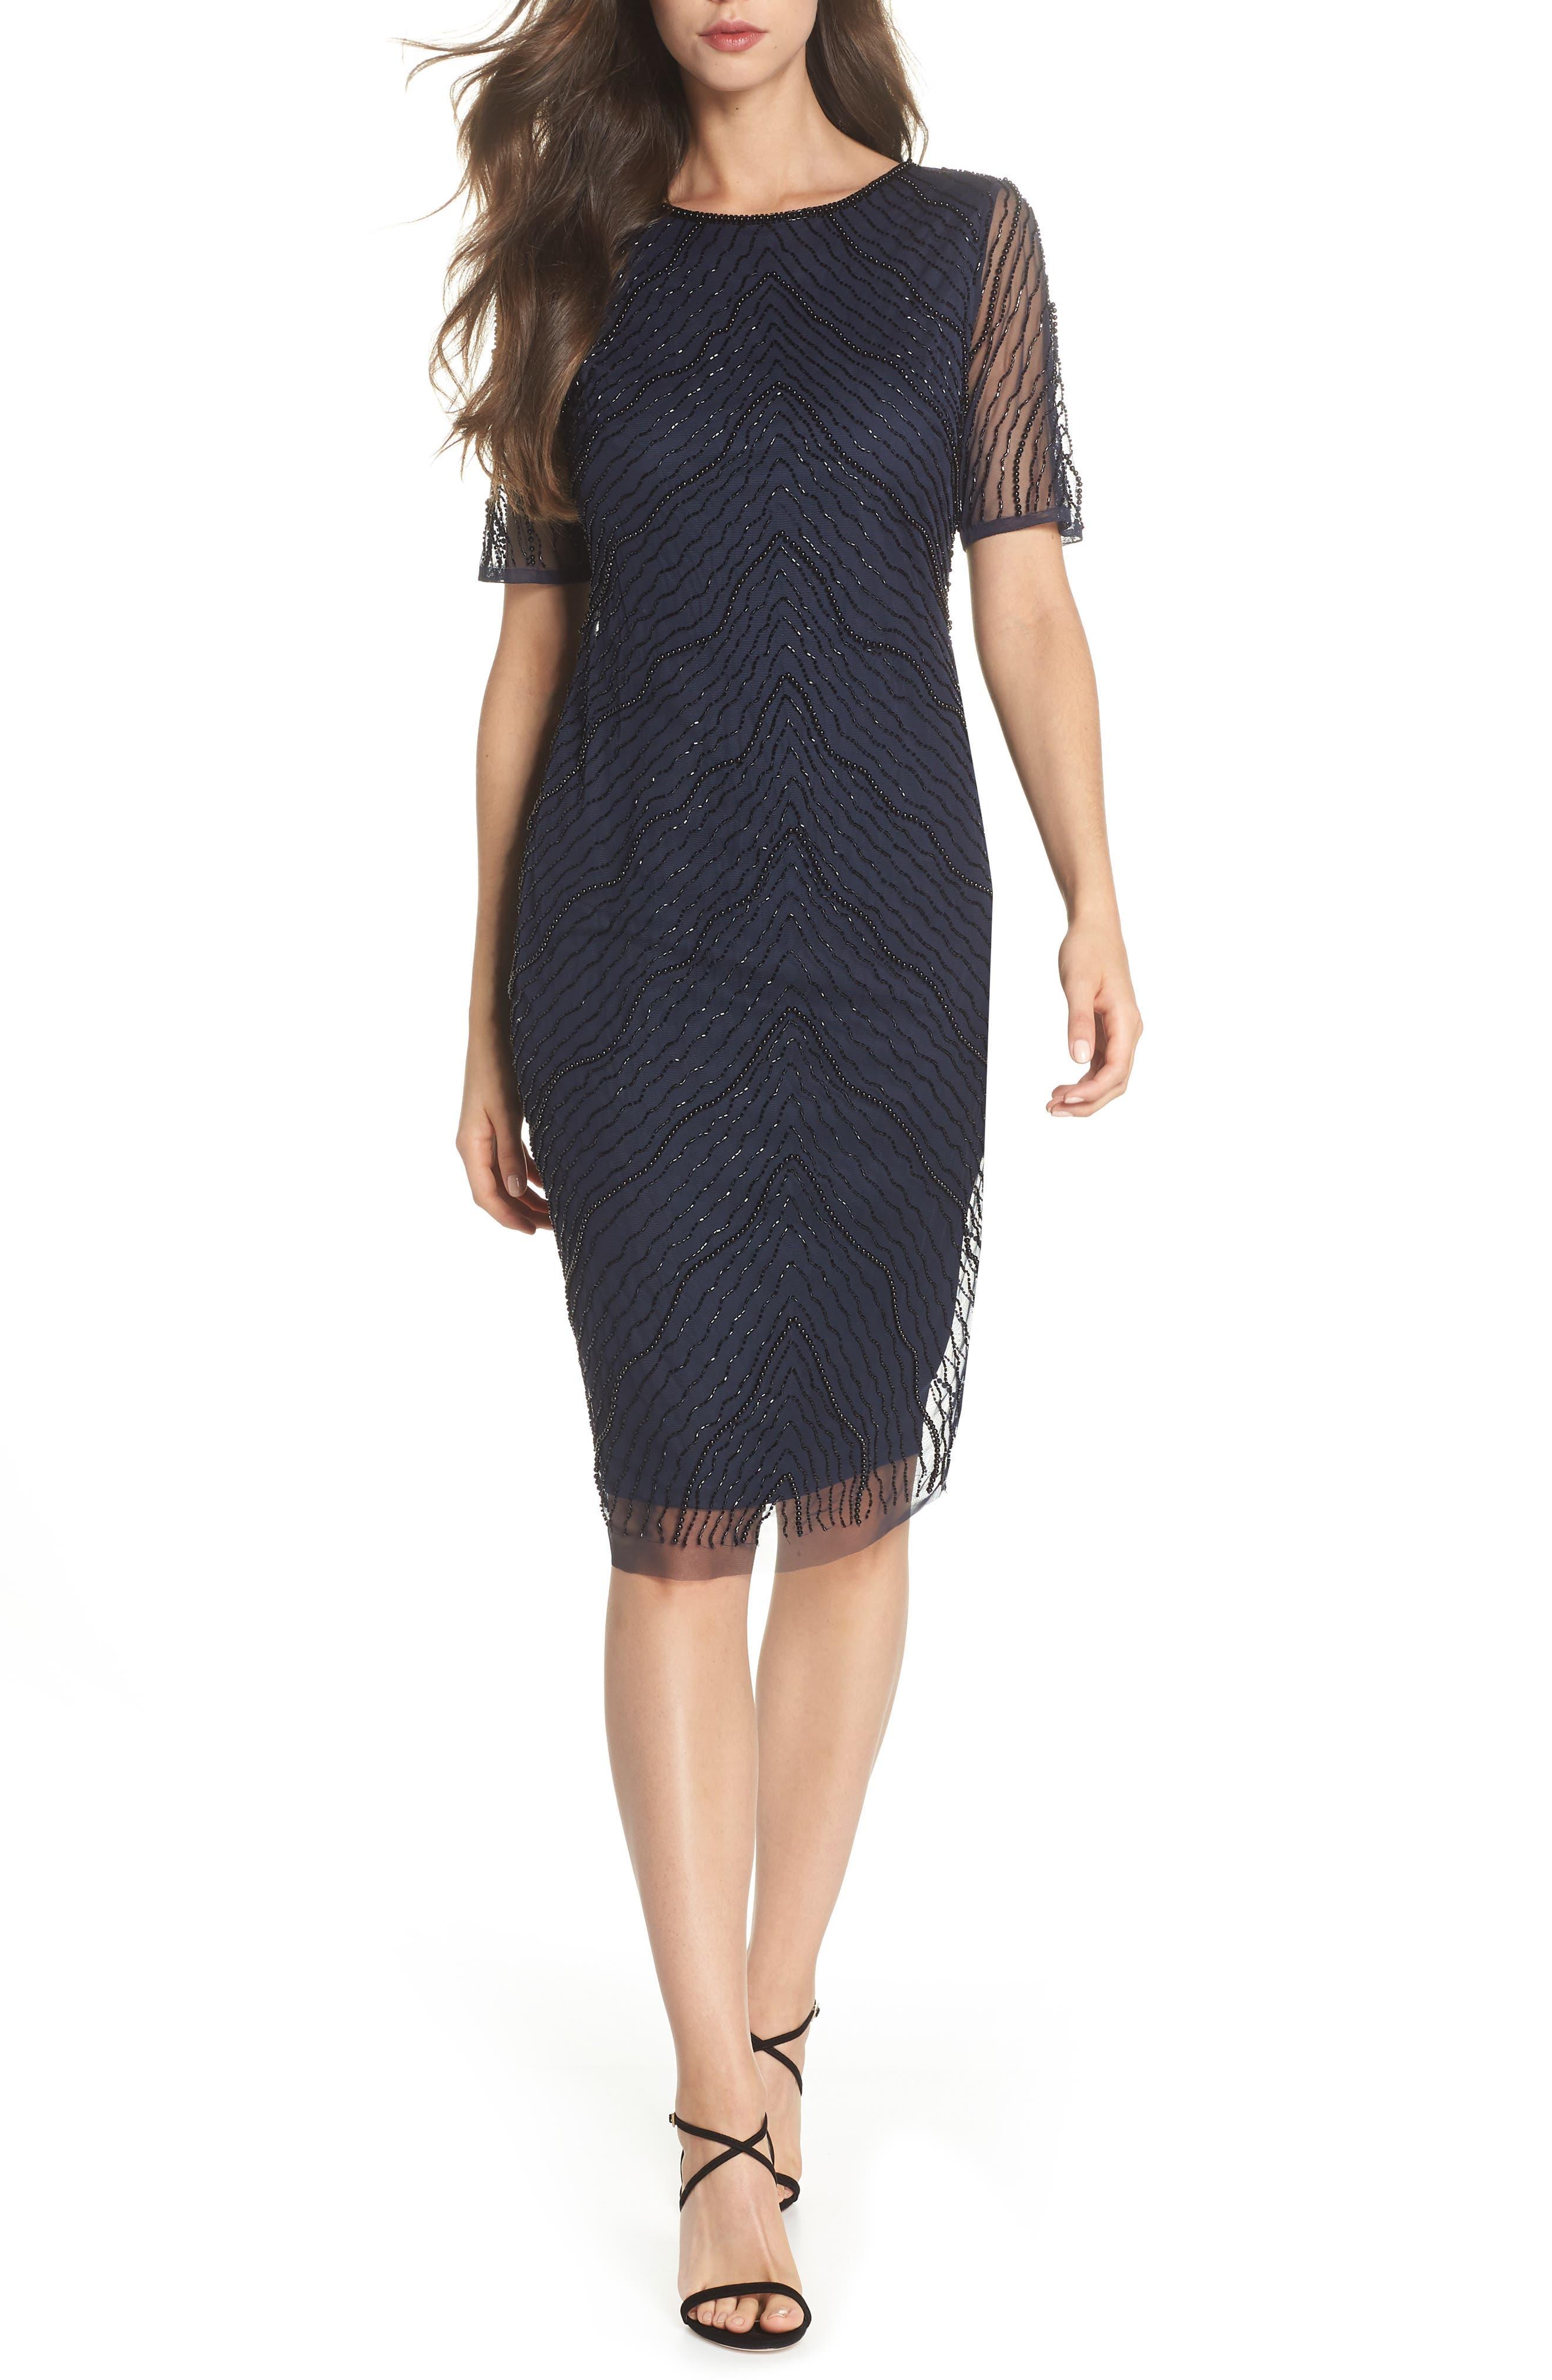 Adrianna Papell Deco Beaded Tulle Sheath Dress